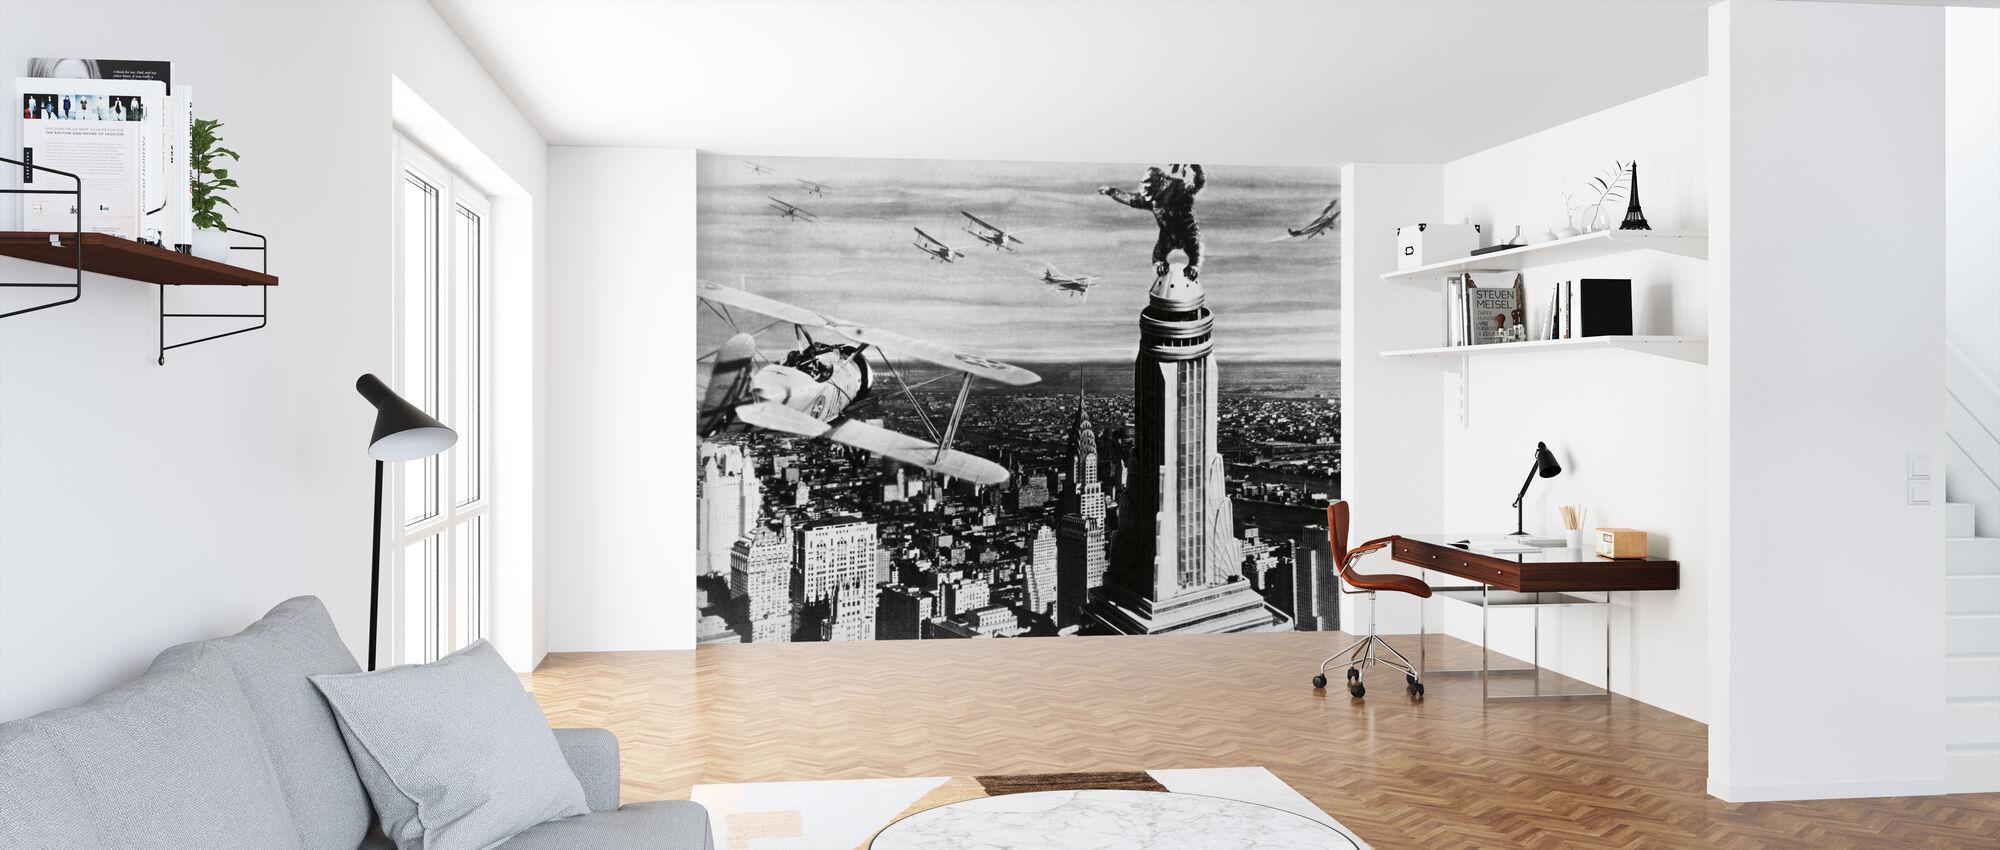 King Kong - Wallpaper - Office